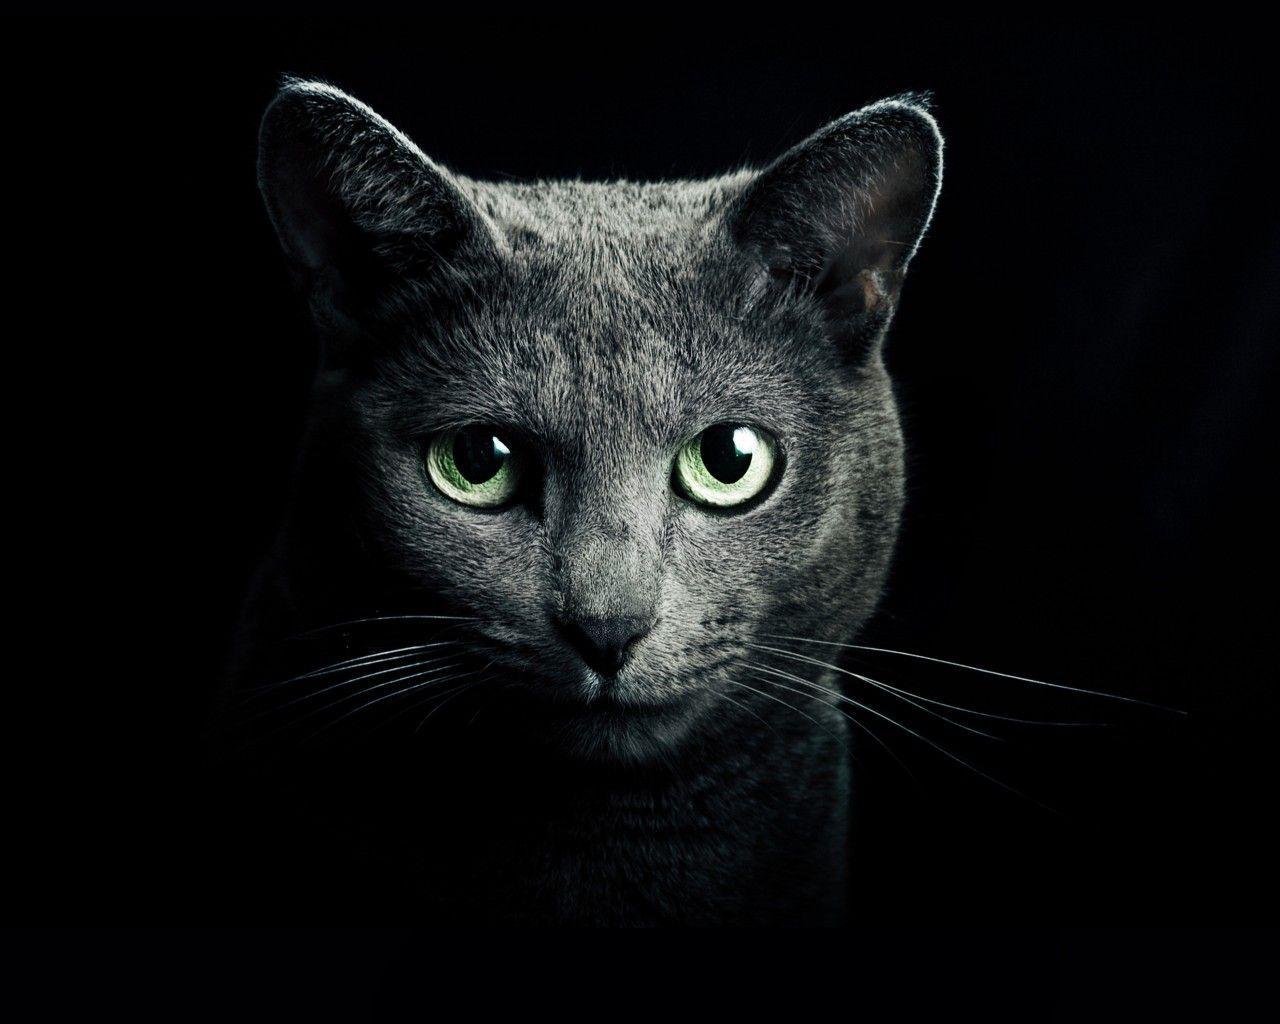 Russian Blue Cat Wallpapers Top Free Russian Blue Cat Backgrounds Wallpaperaccess